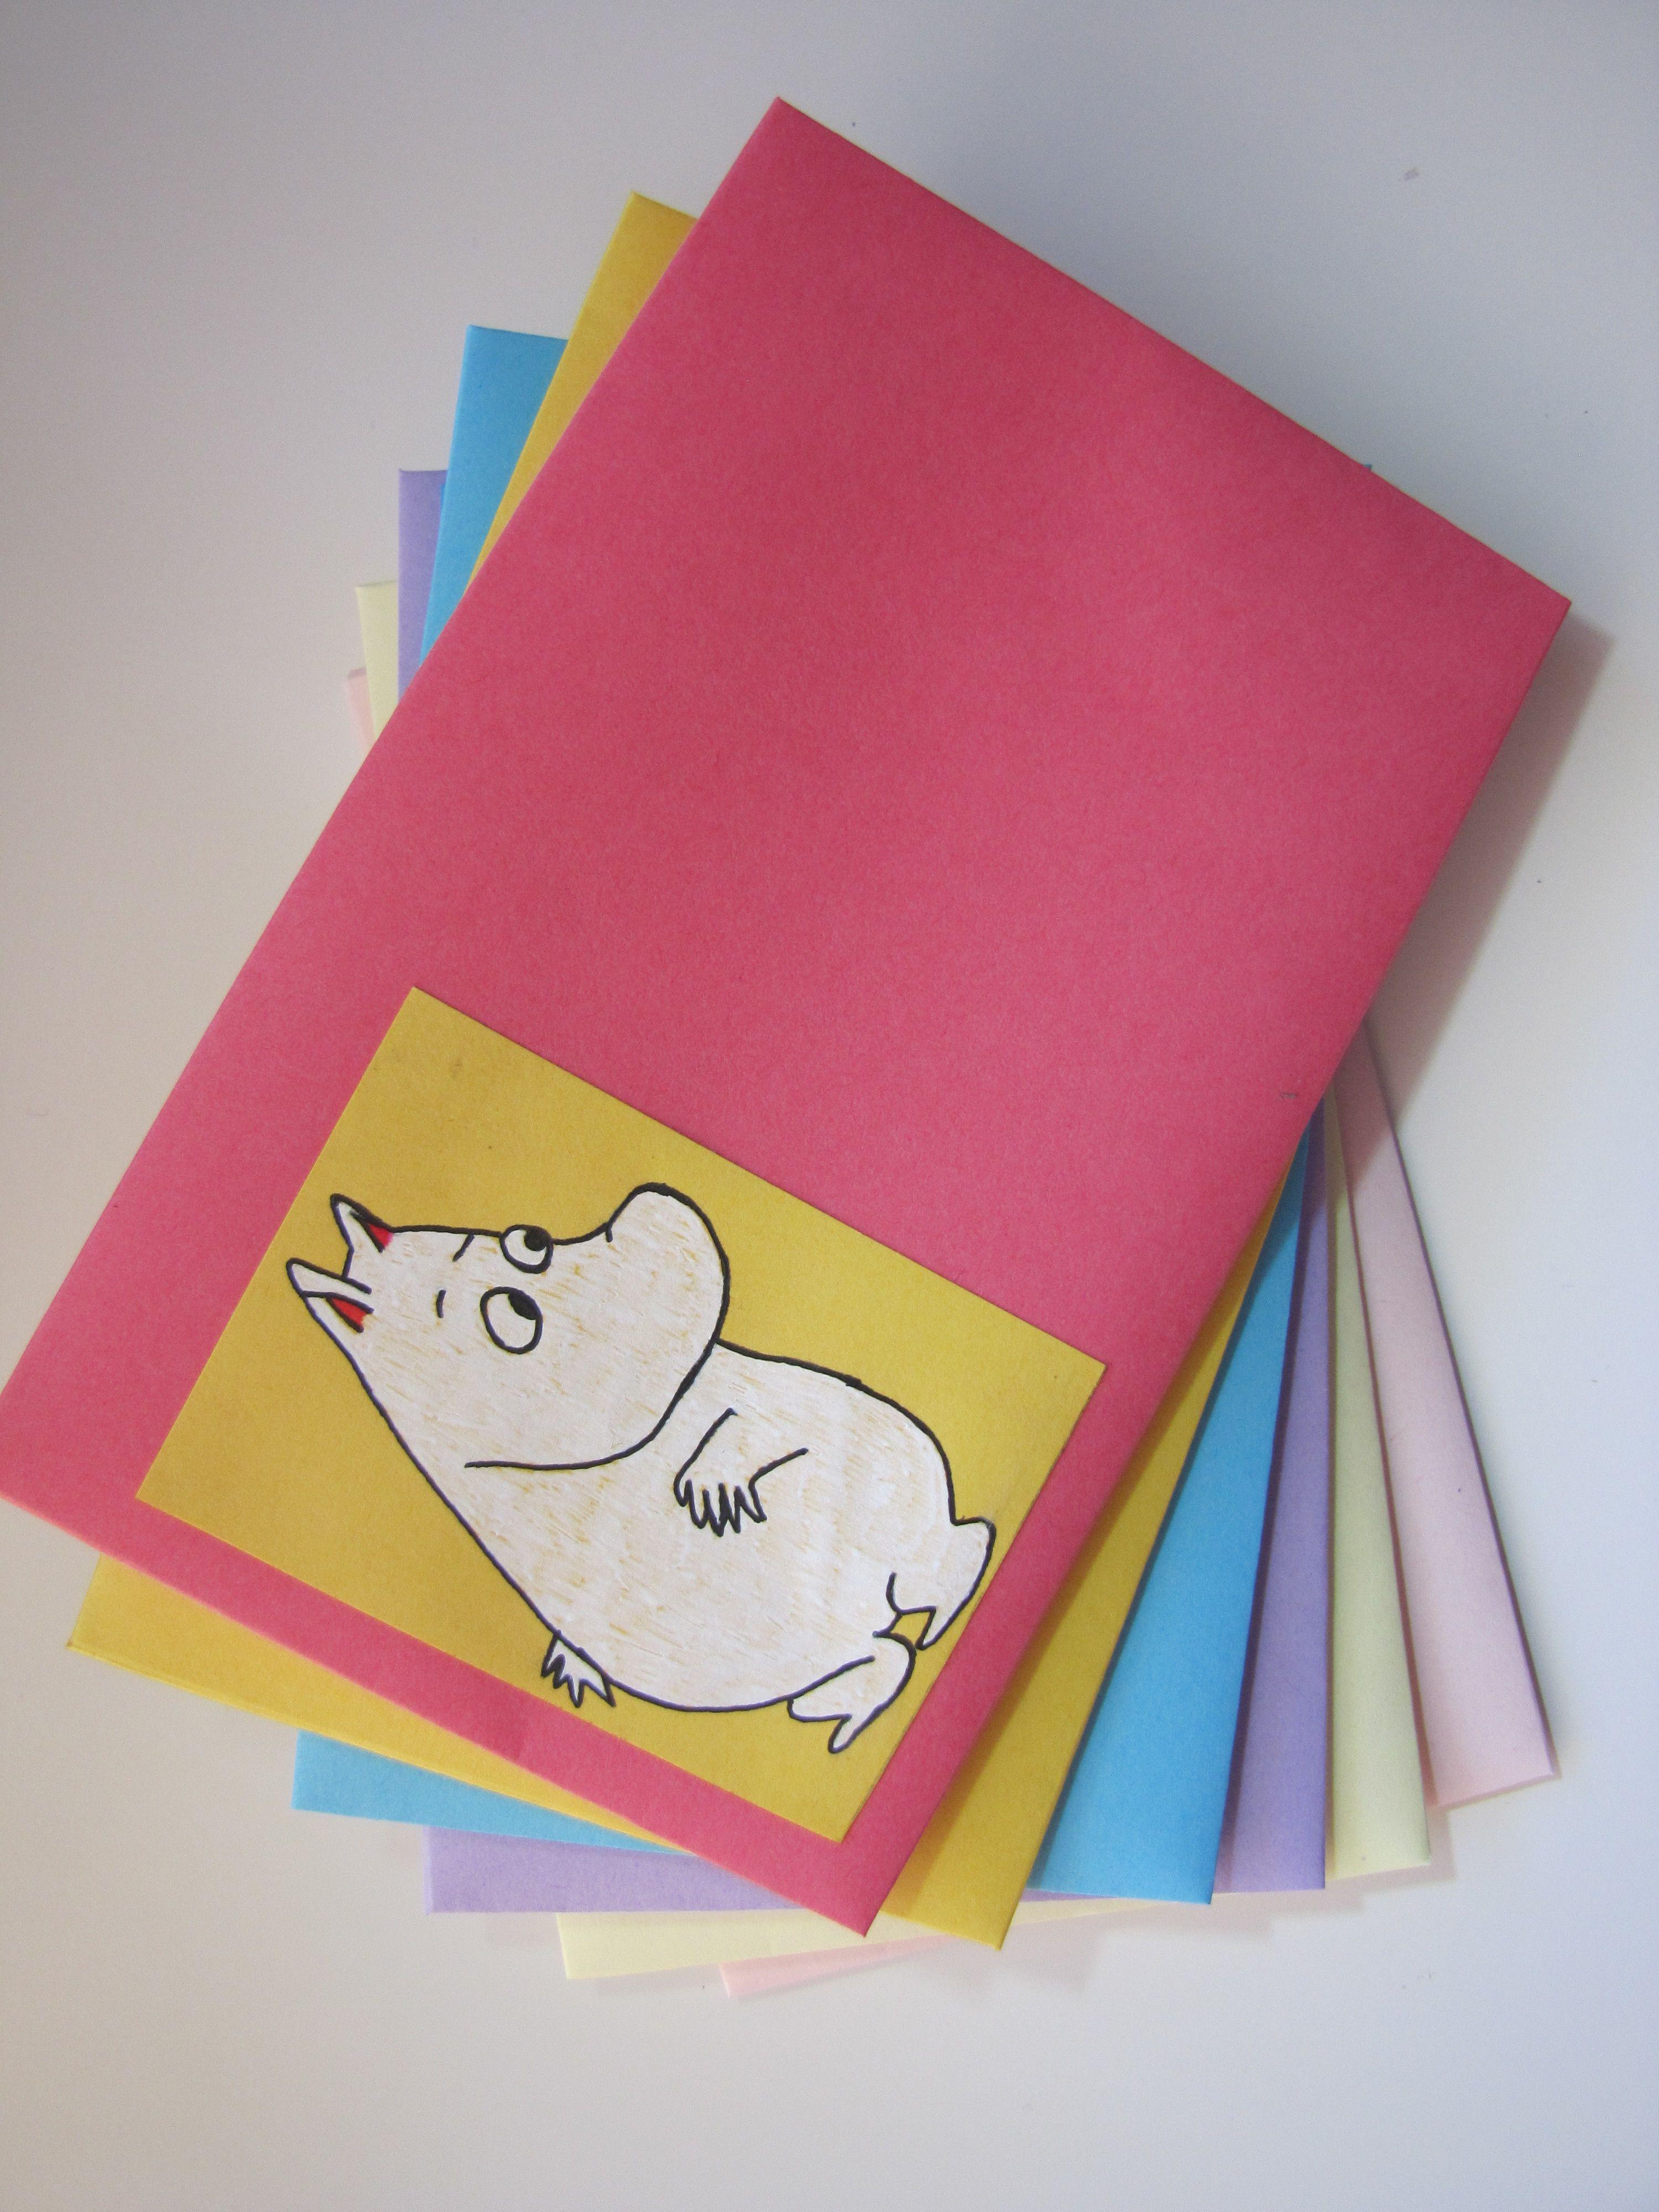 Muumi envelopes